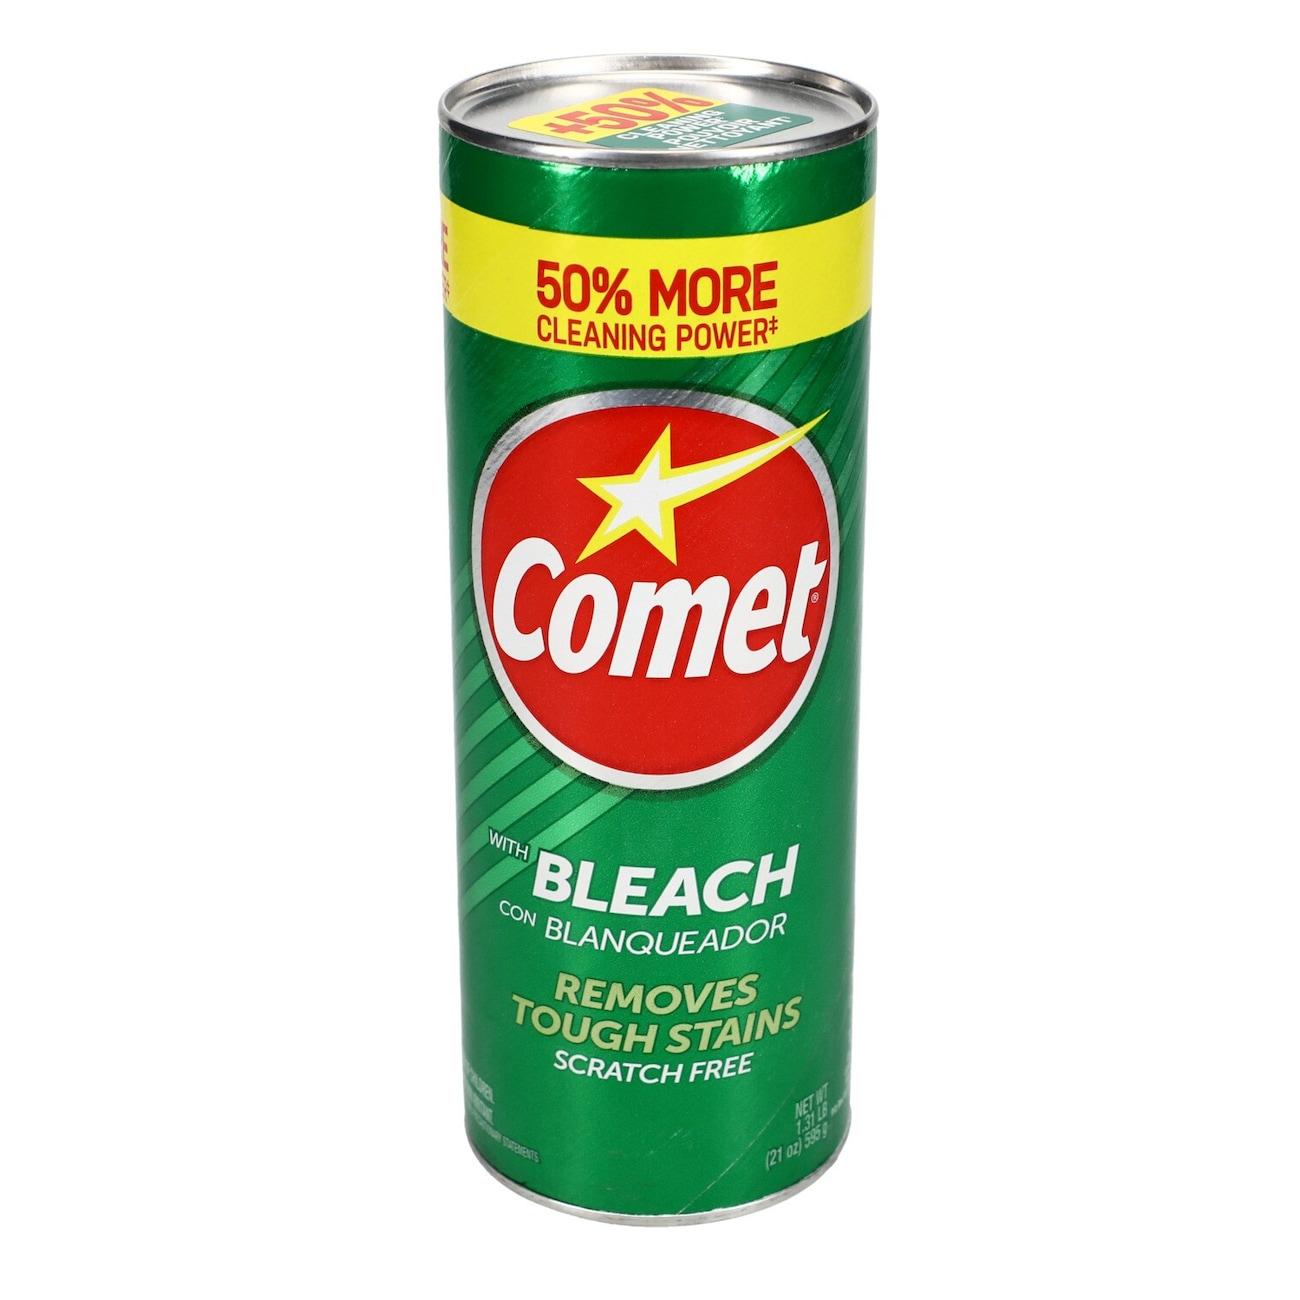 Comet Disinfectant Cleaners, 25 oz  Bonus Containers